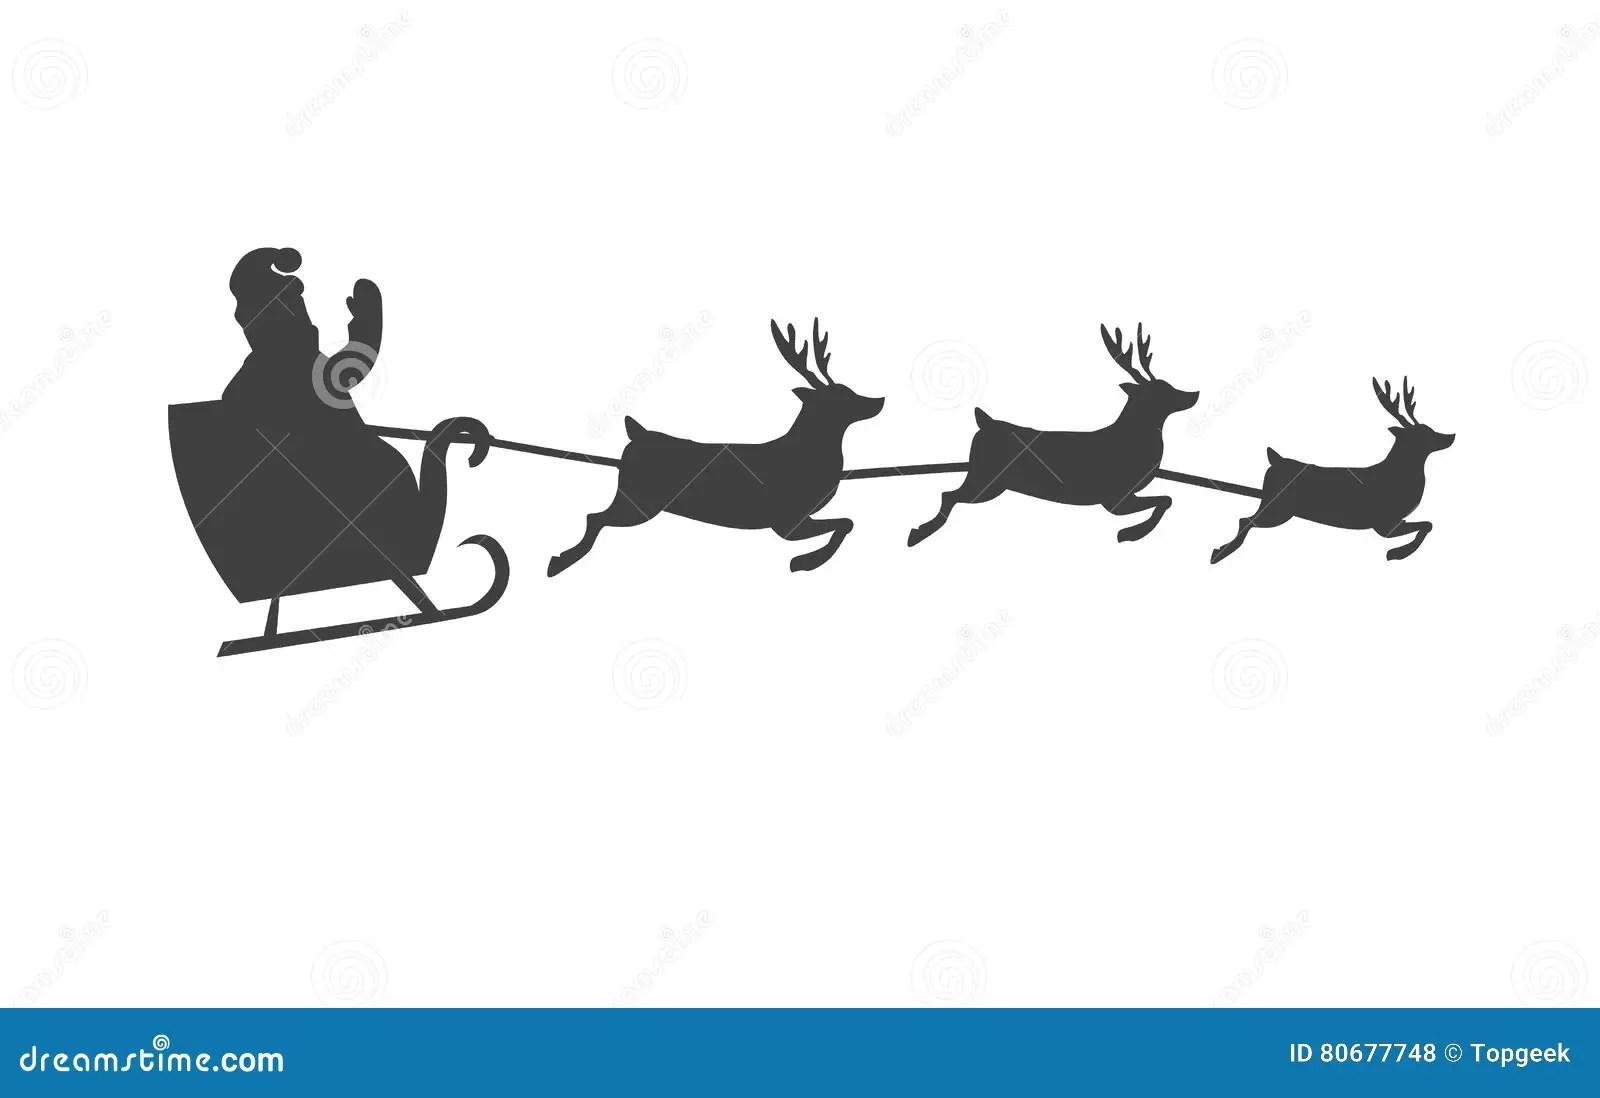 Santa S Sleigh With Reindeer Vector Silhouette Stock